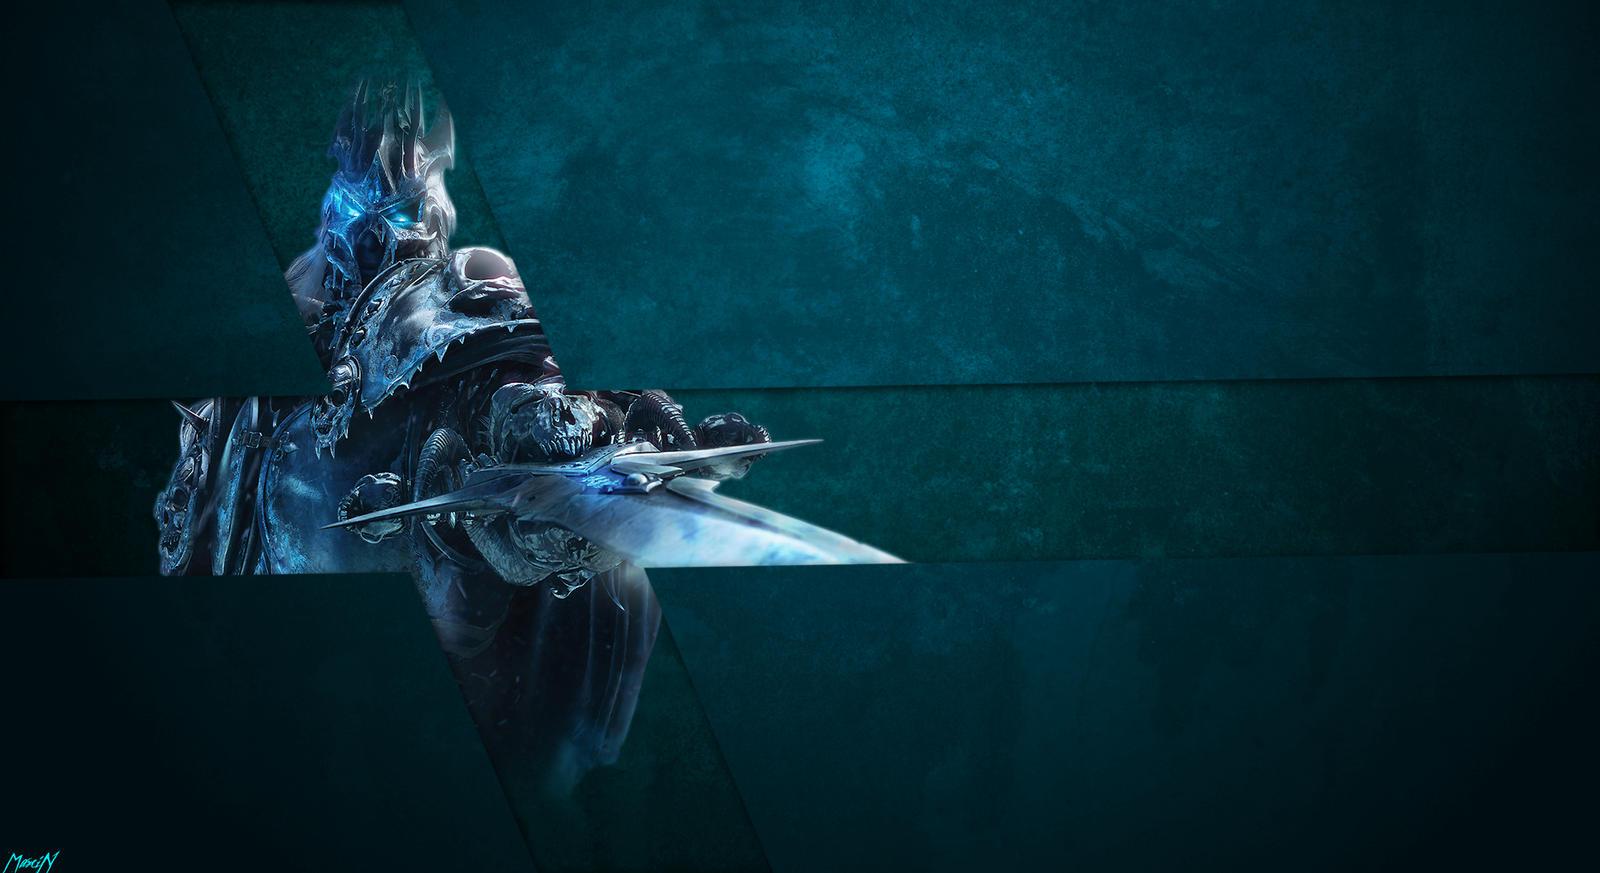 World Of Warcraft Lich King Wallpaper By Kaster533 On Deviantart